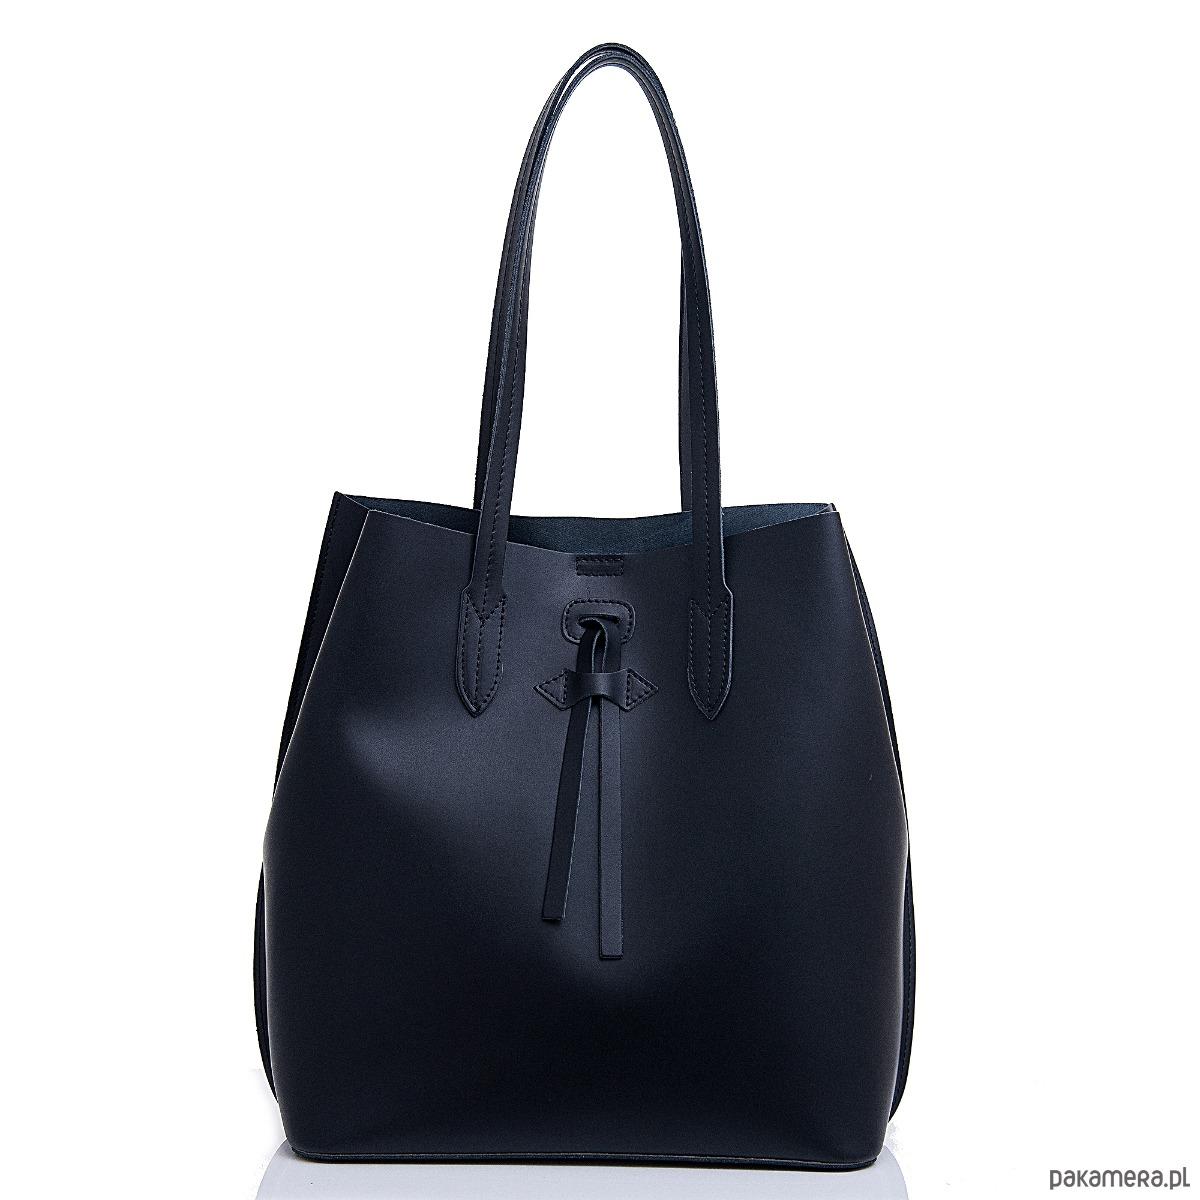 2190d3199433f Czarna torebka damska skórzana na ramię. - torebki do ręki - Pakamera.pl